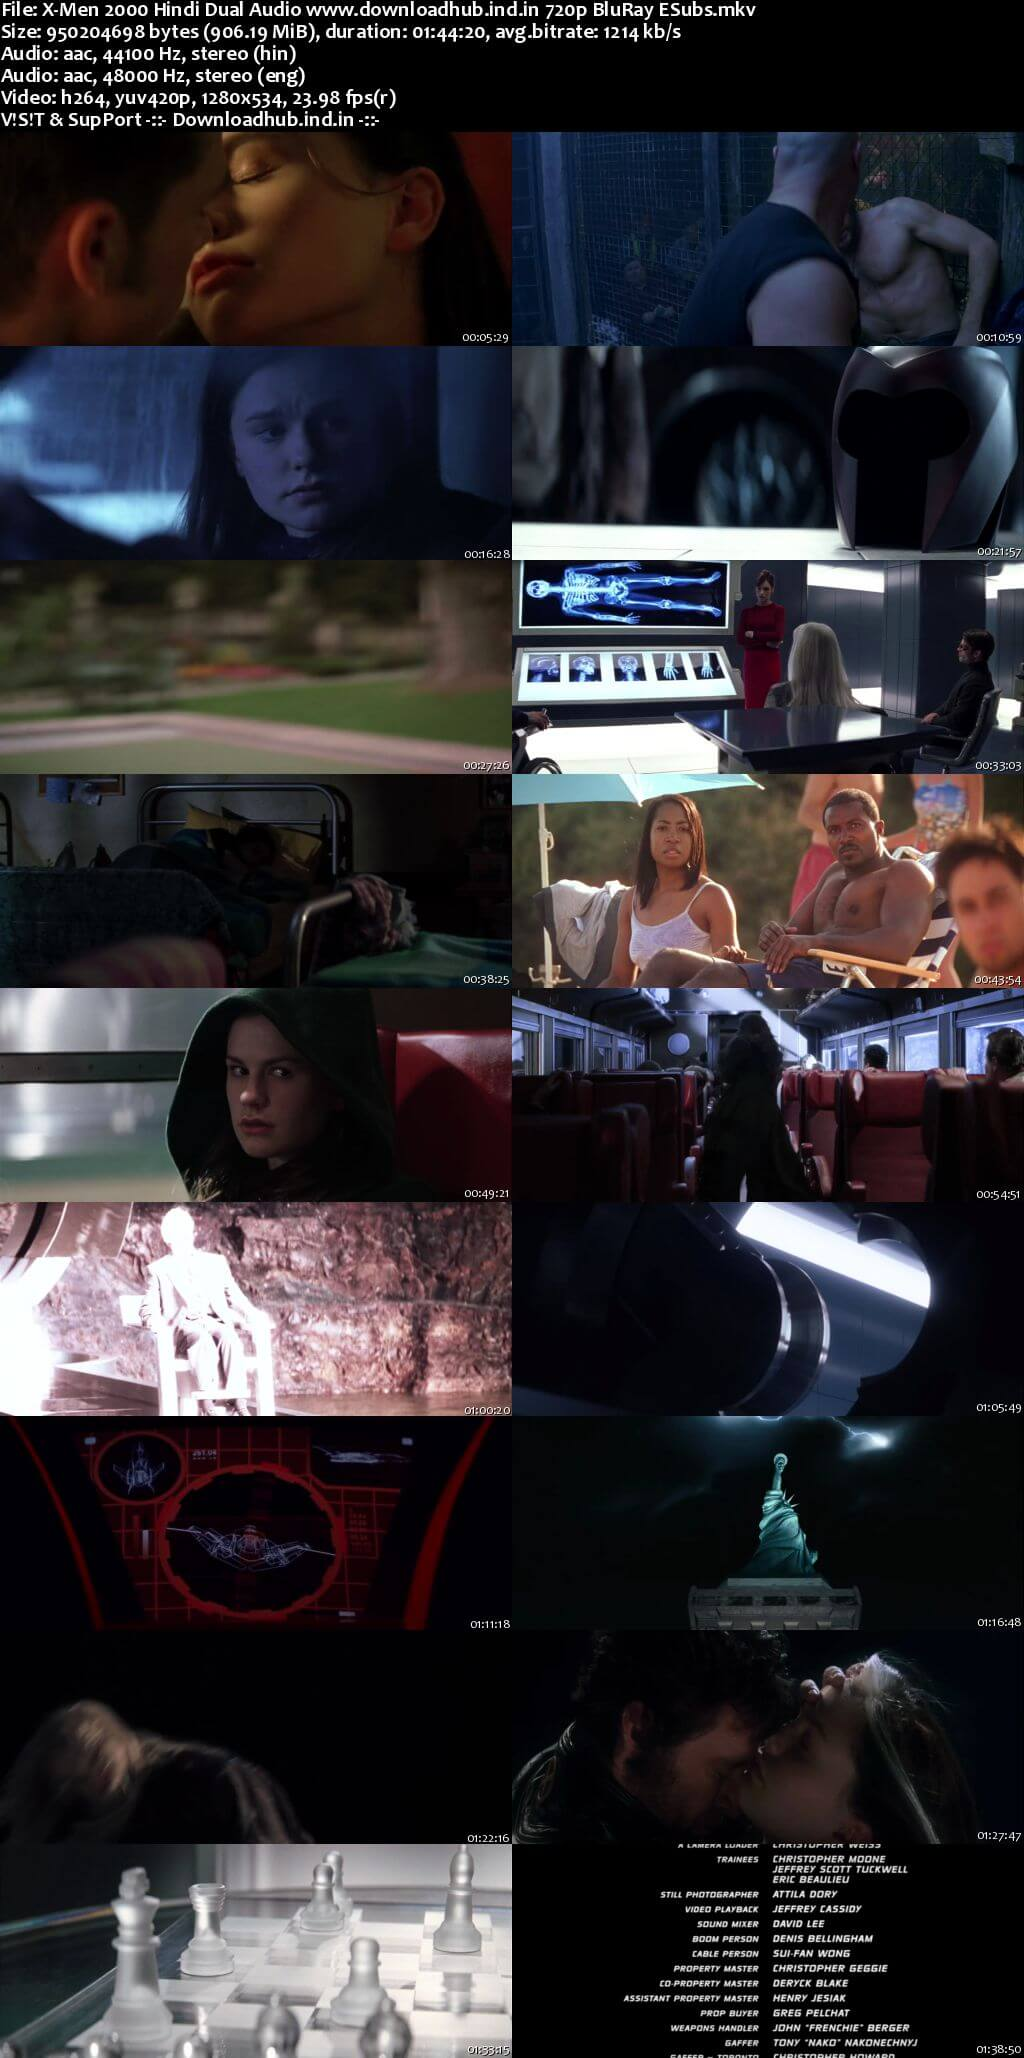 X-Men 2000 Hindi Dual Audio 720p BluRay ESubs